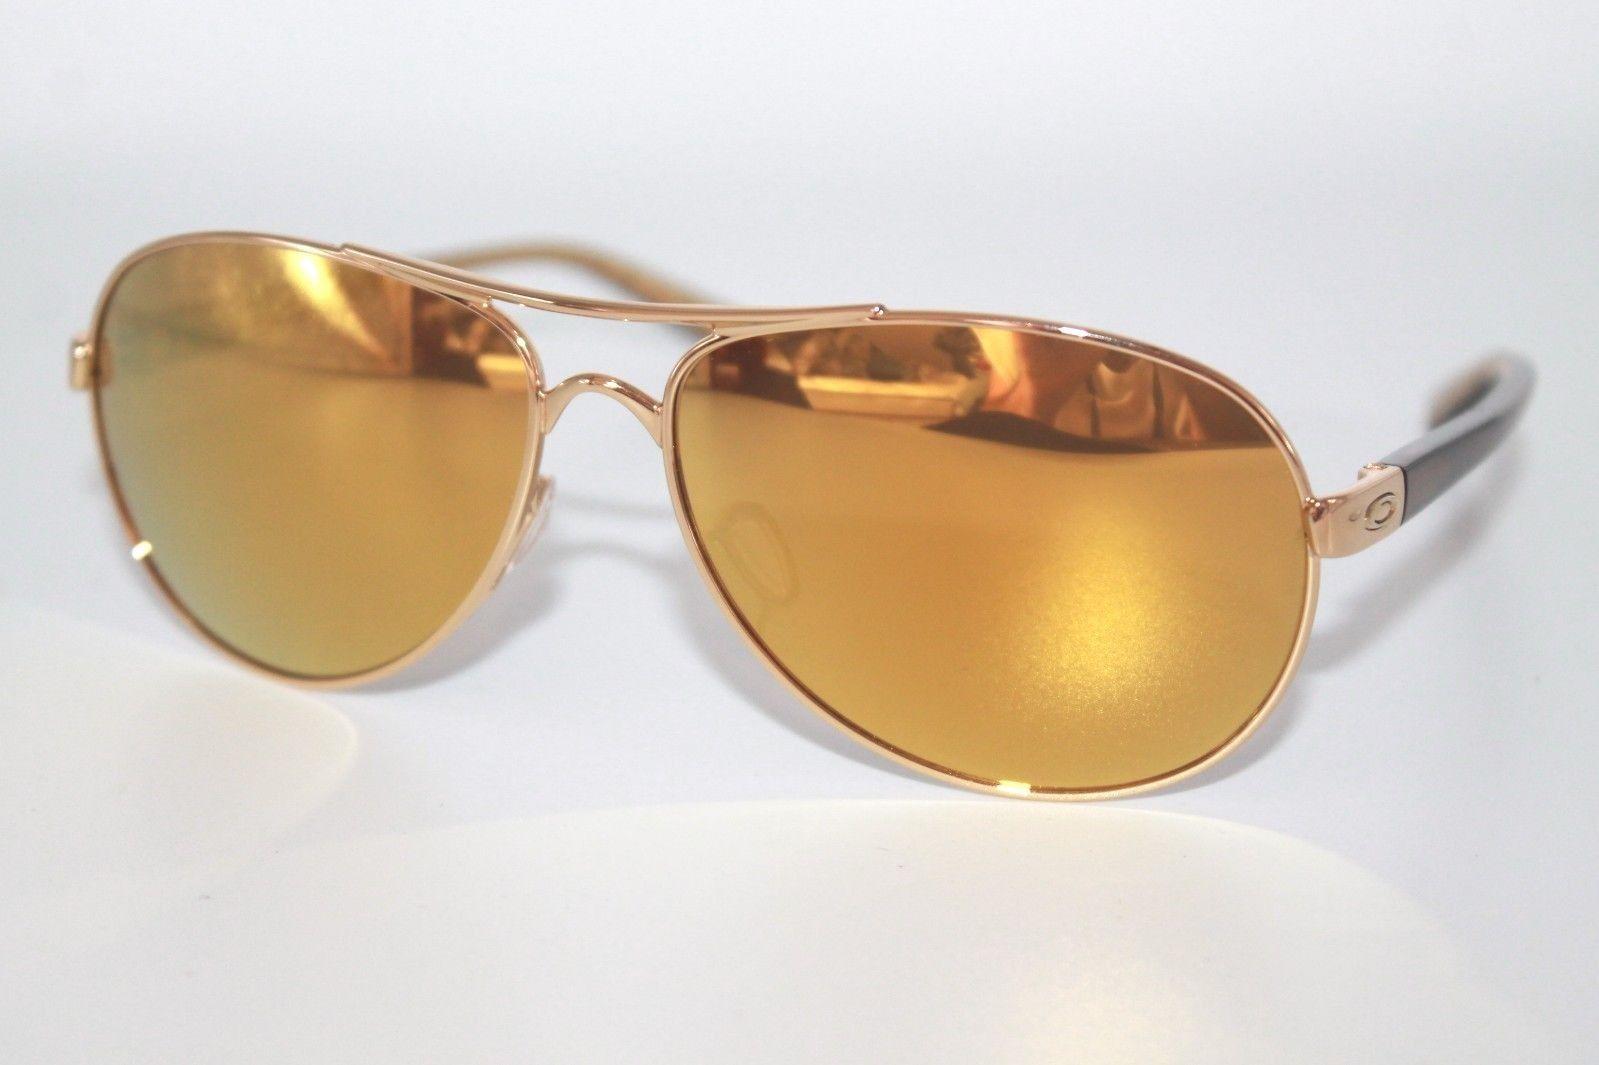 aa0b97aec2 57. 57. Previous. Oakley Feedback Sunglasses OO4079-28 Polished Gold W  24K  Gold iridium Lens. Oakley Feedback ...